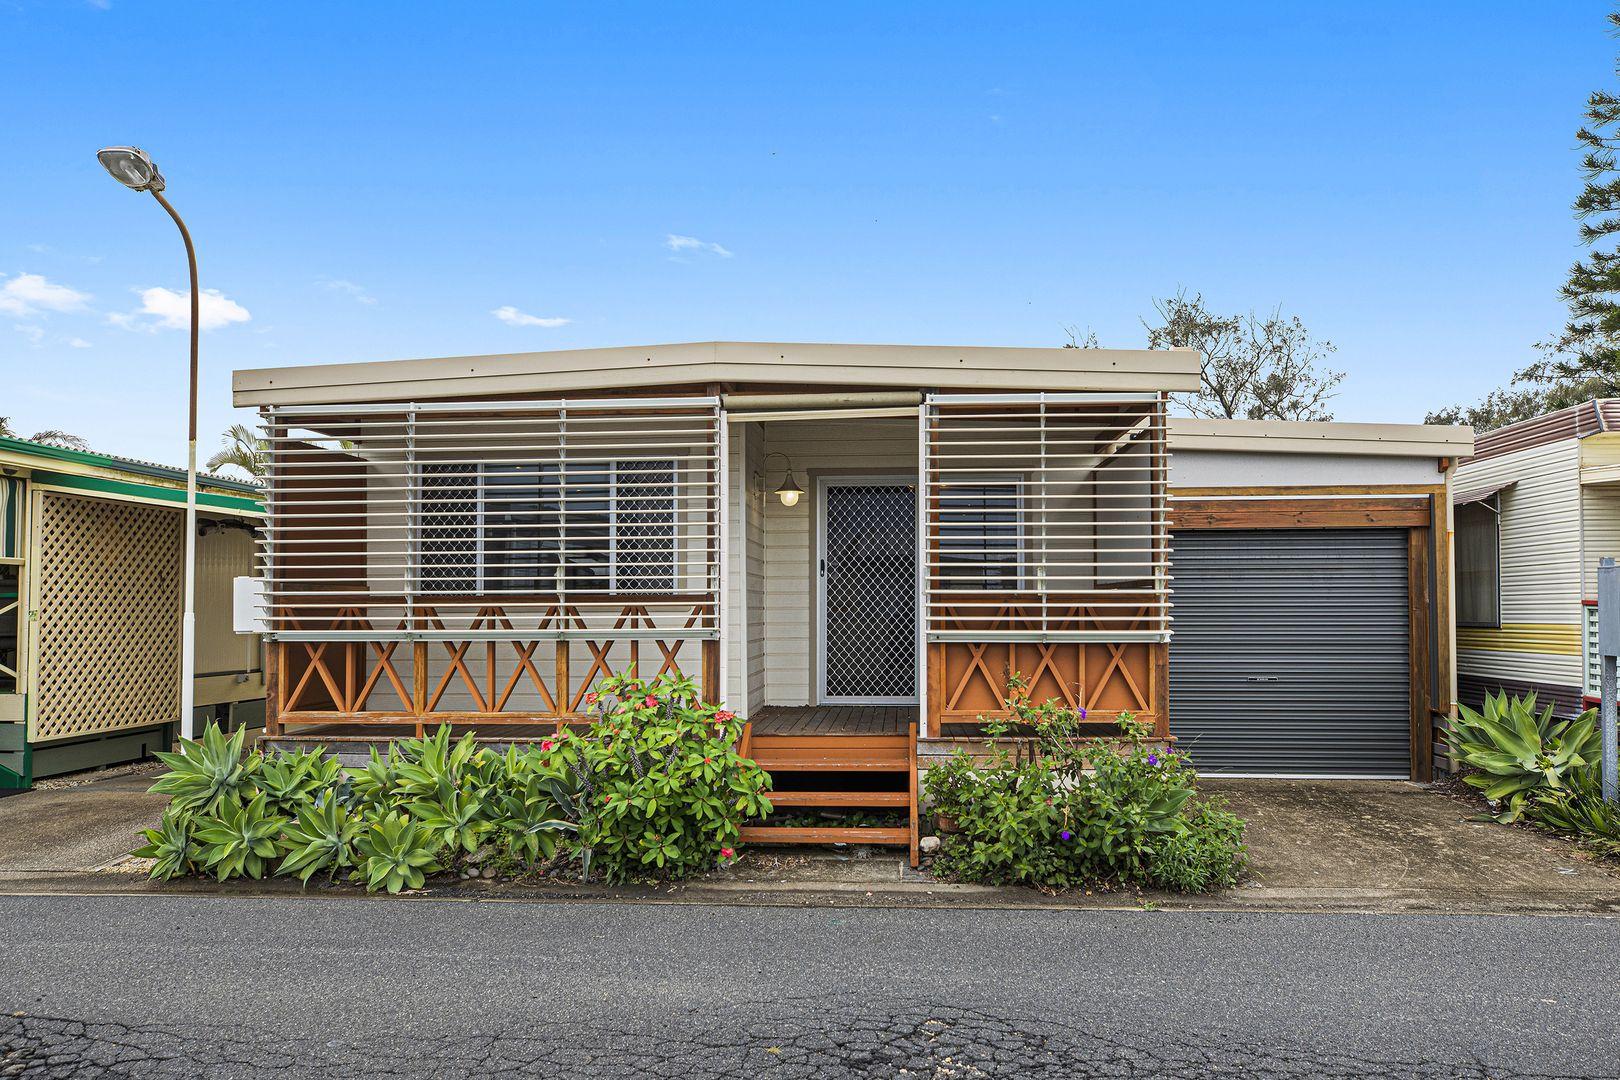 T21/52 Wellington Drive, Nambucca Heads NSW 2448, Image 0